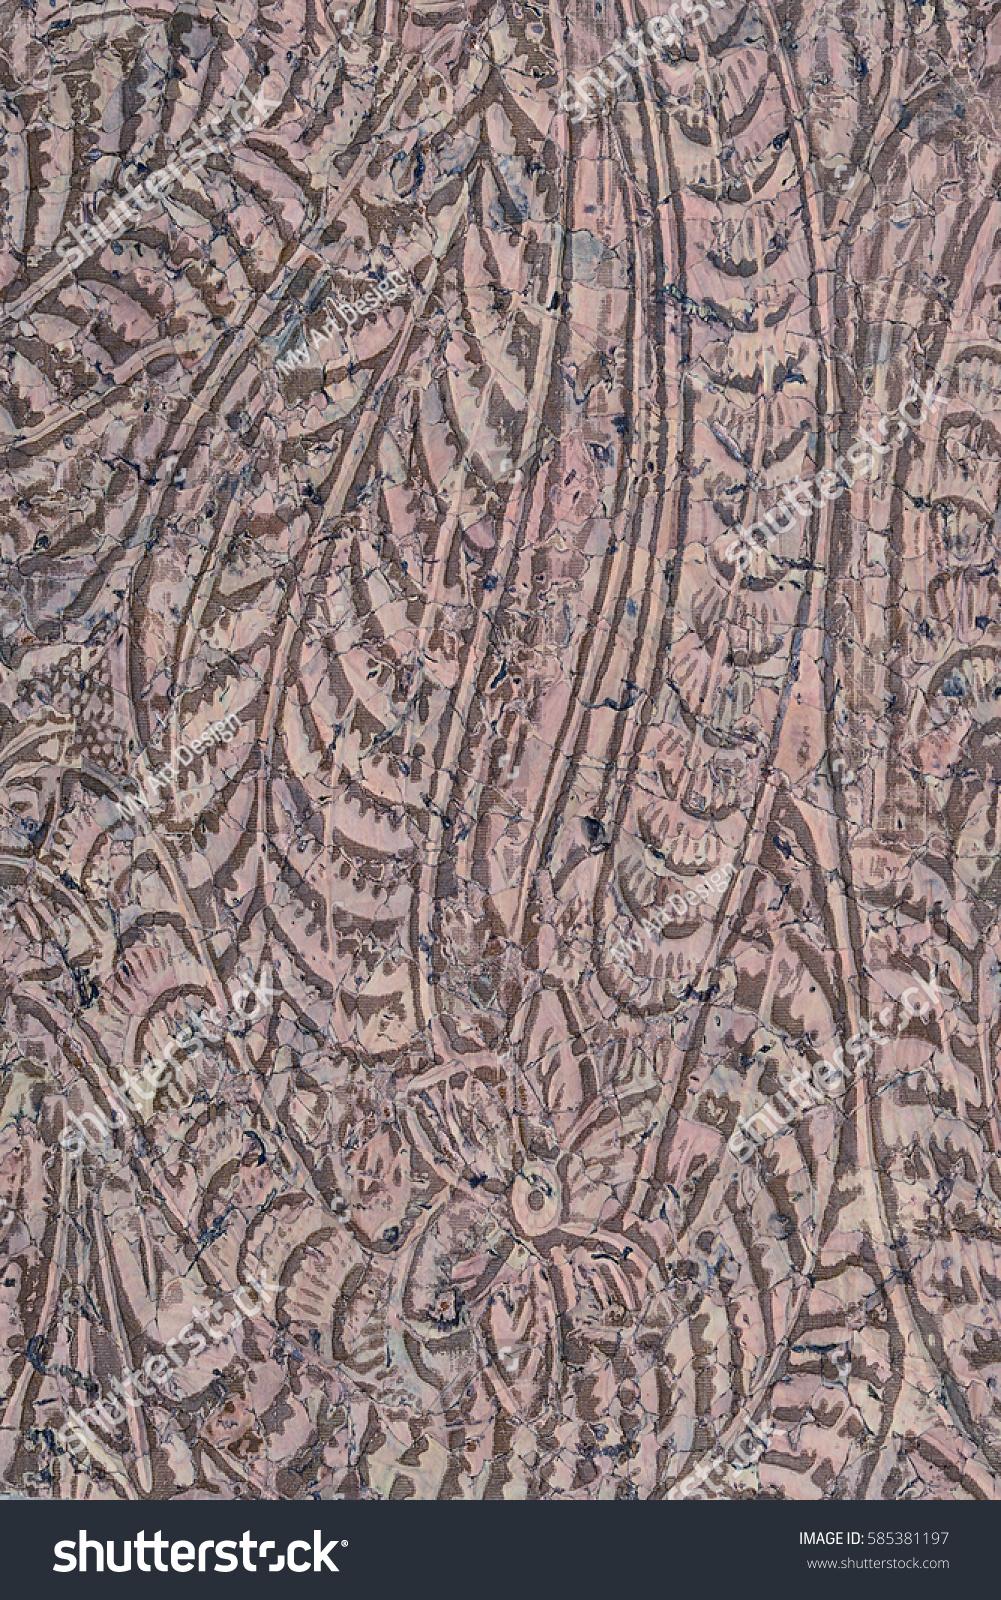 wooden texture background pattern high resolution stock